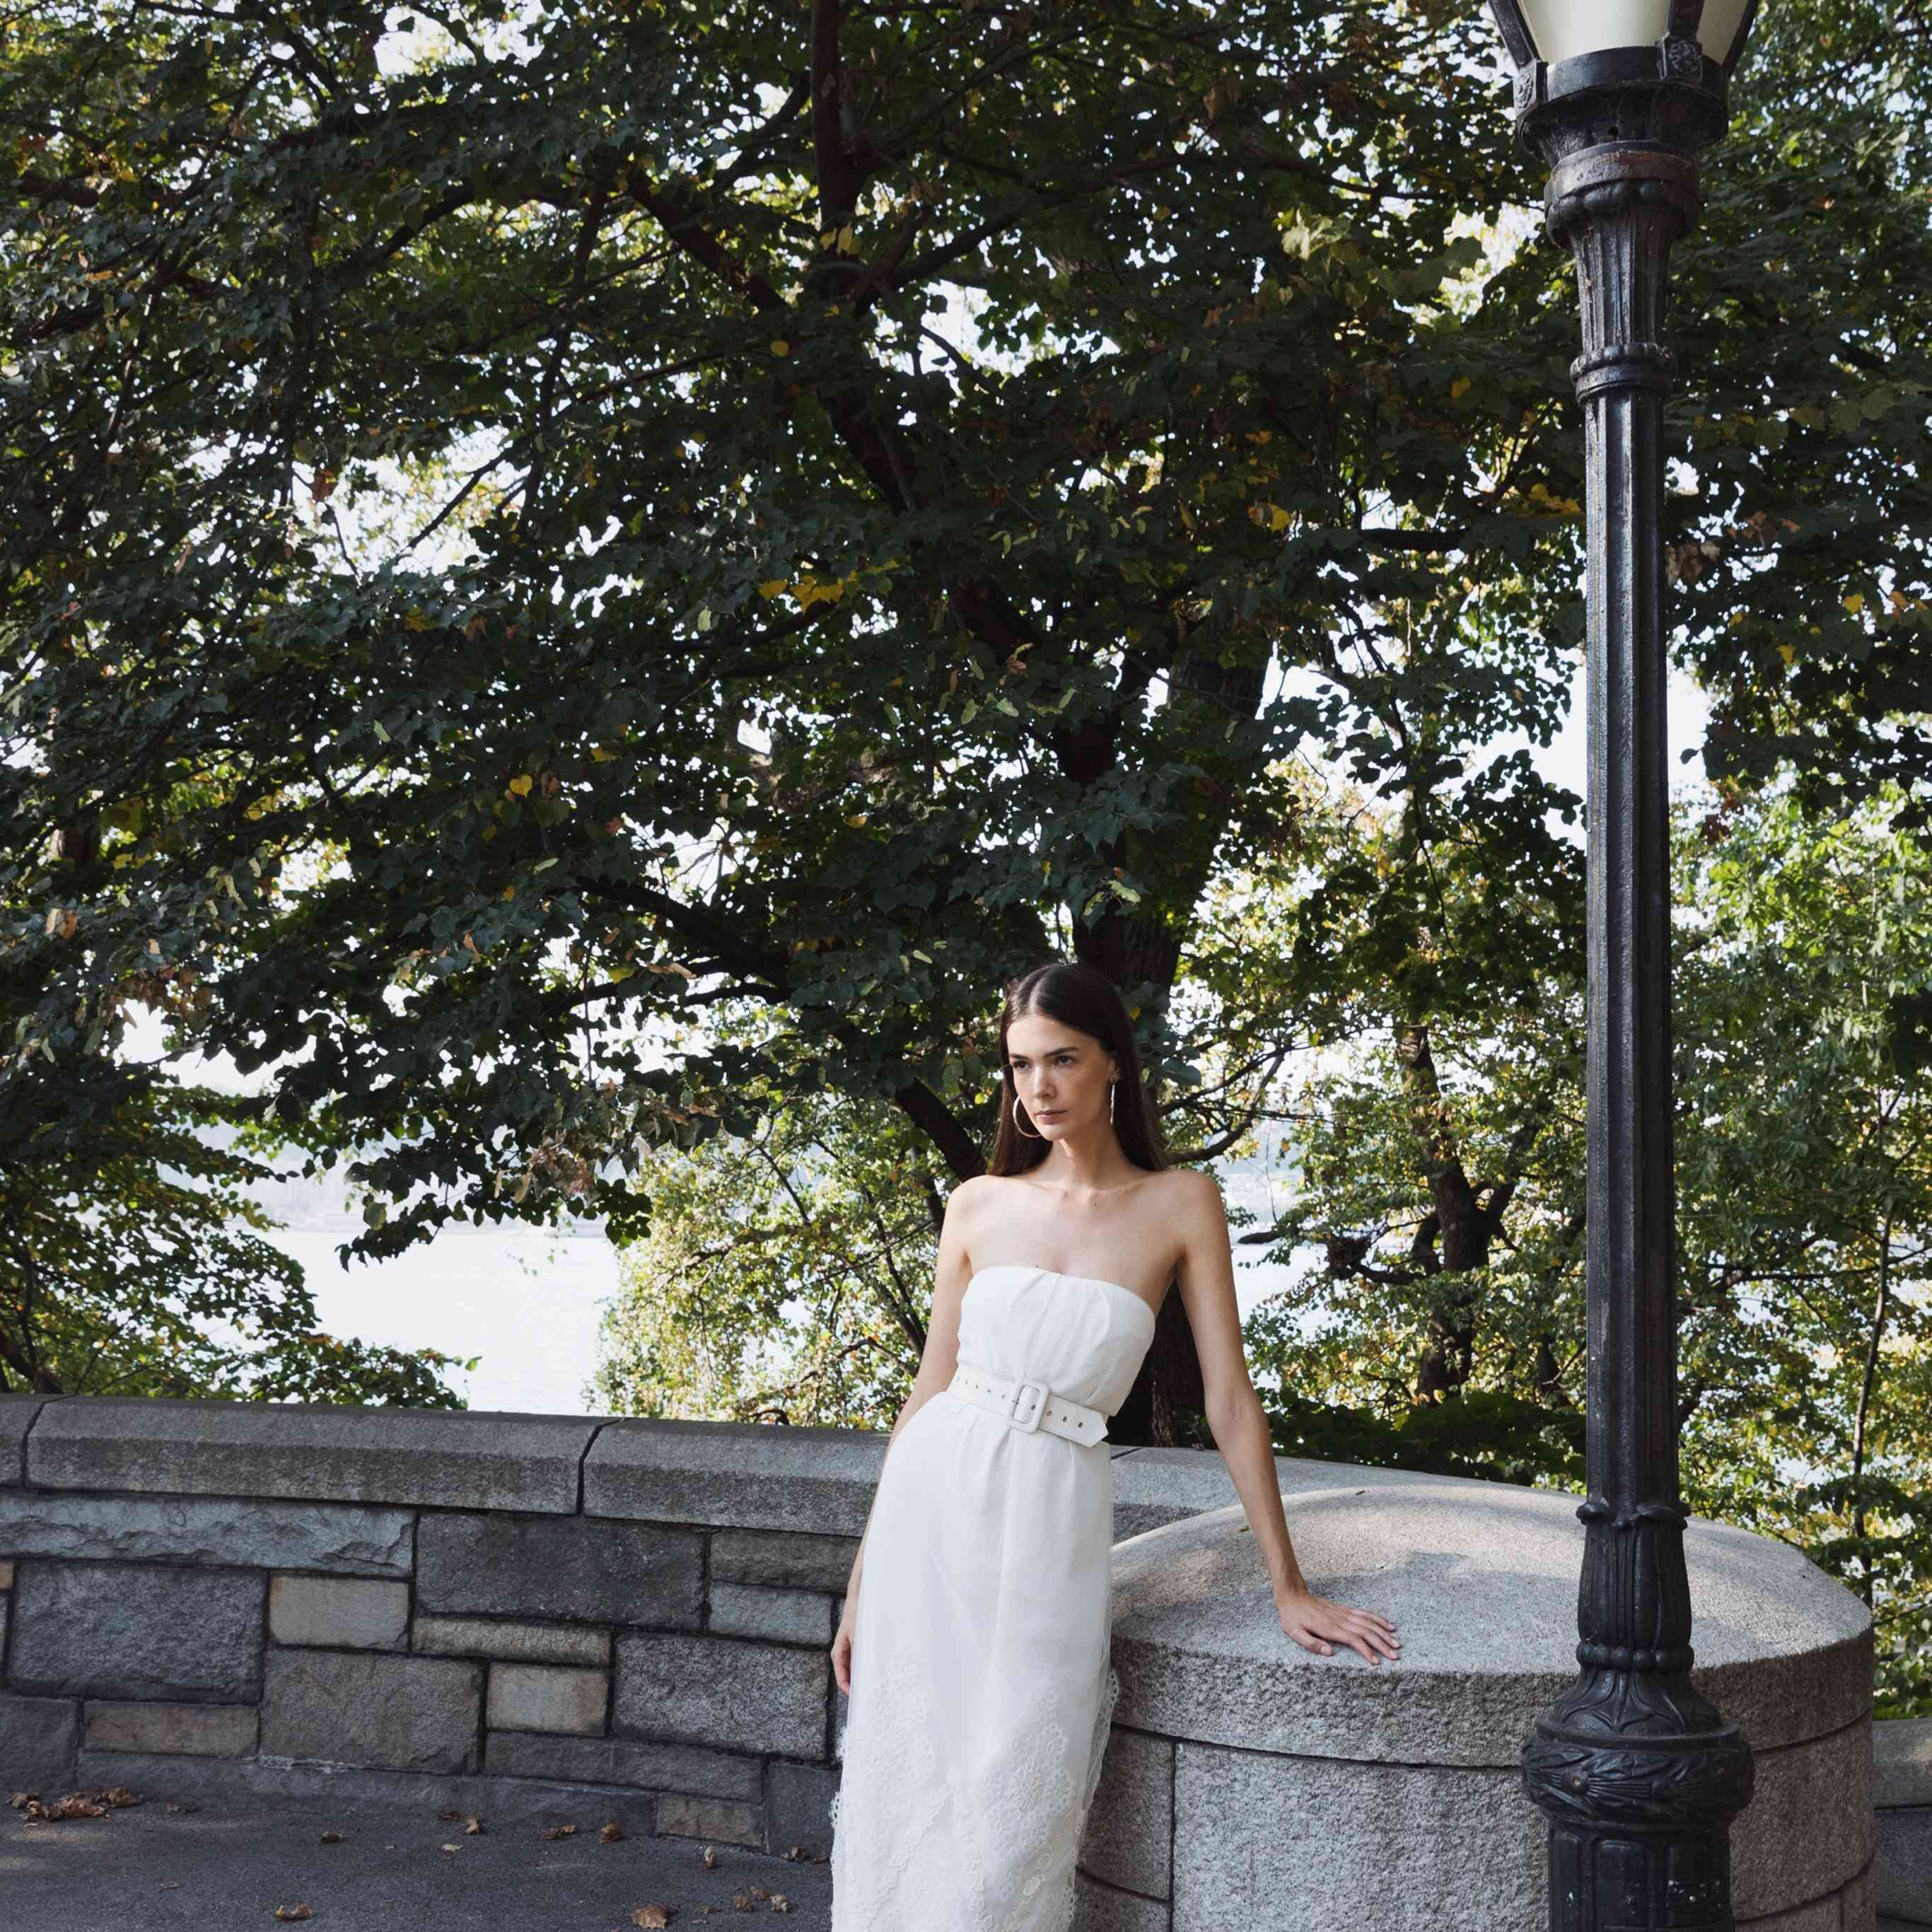 Model in strapless wedding dress